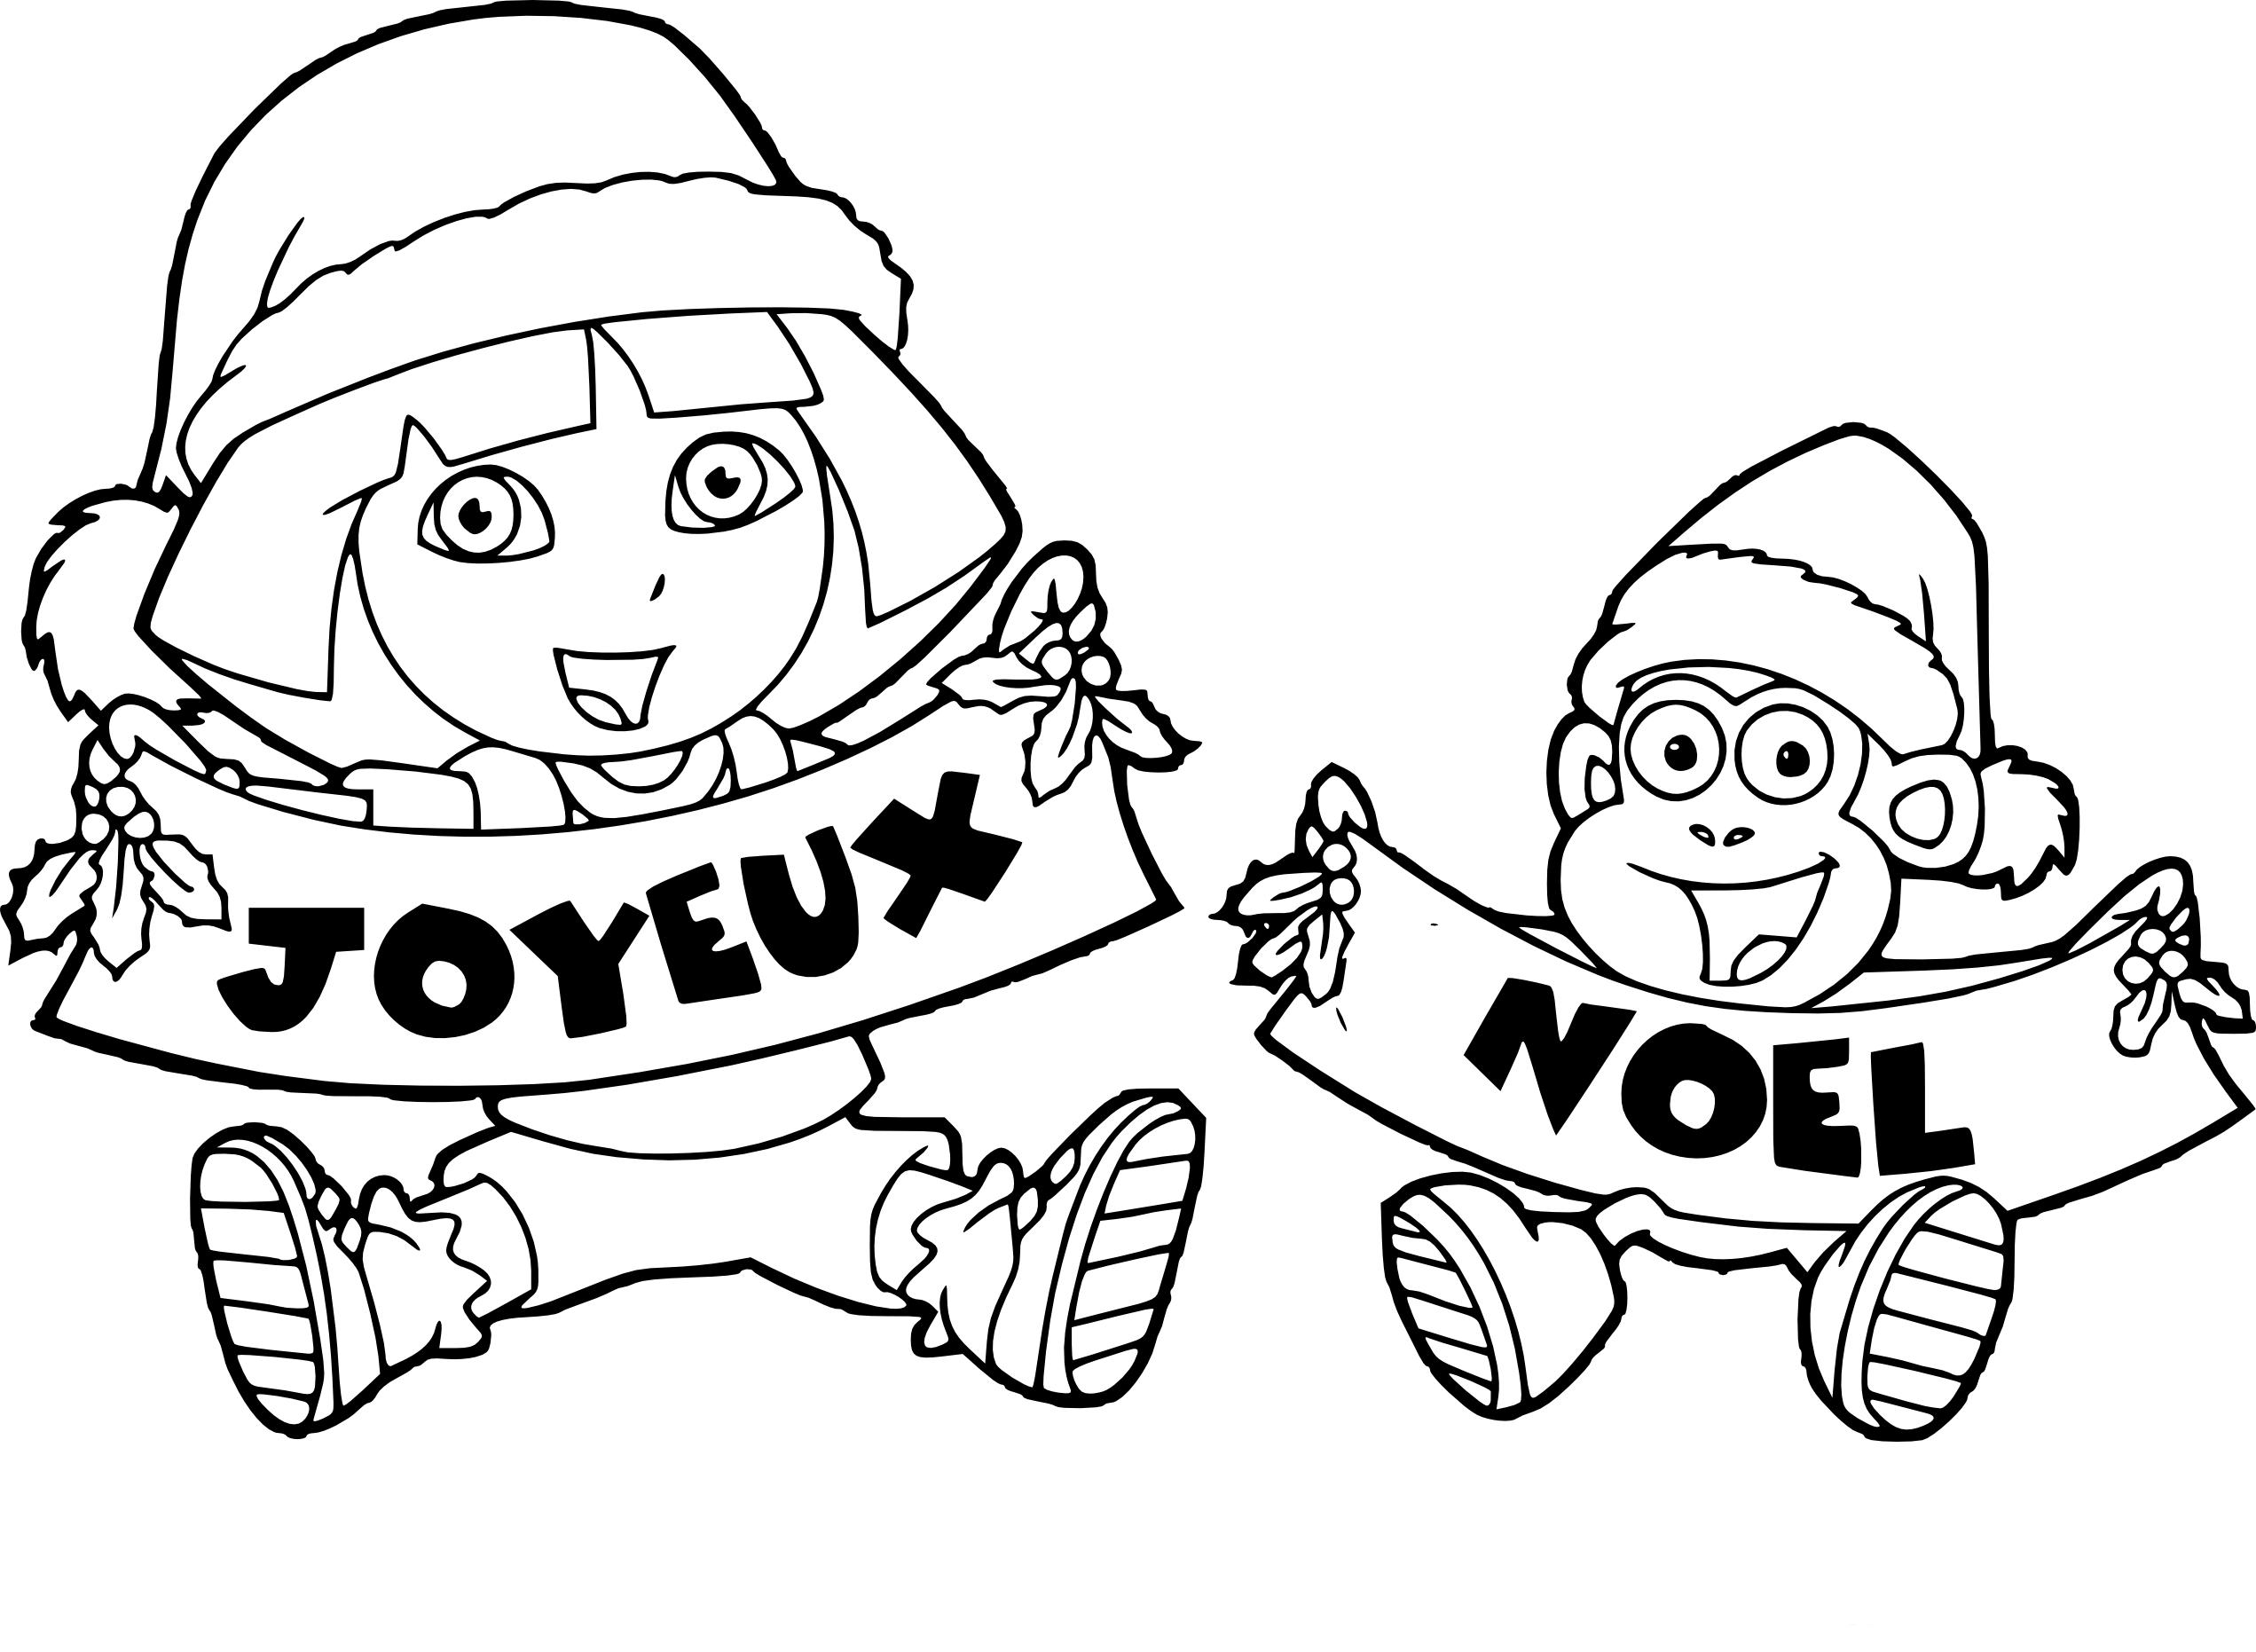 Coloriage Dora L Exploratrice Joyeux Noel A Imprimer